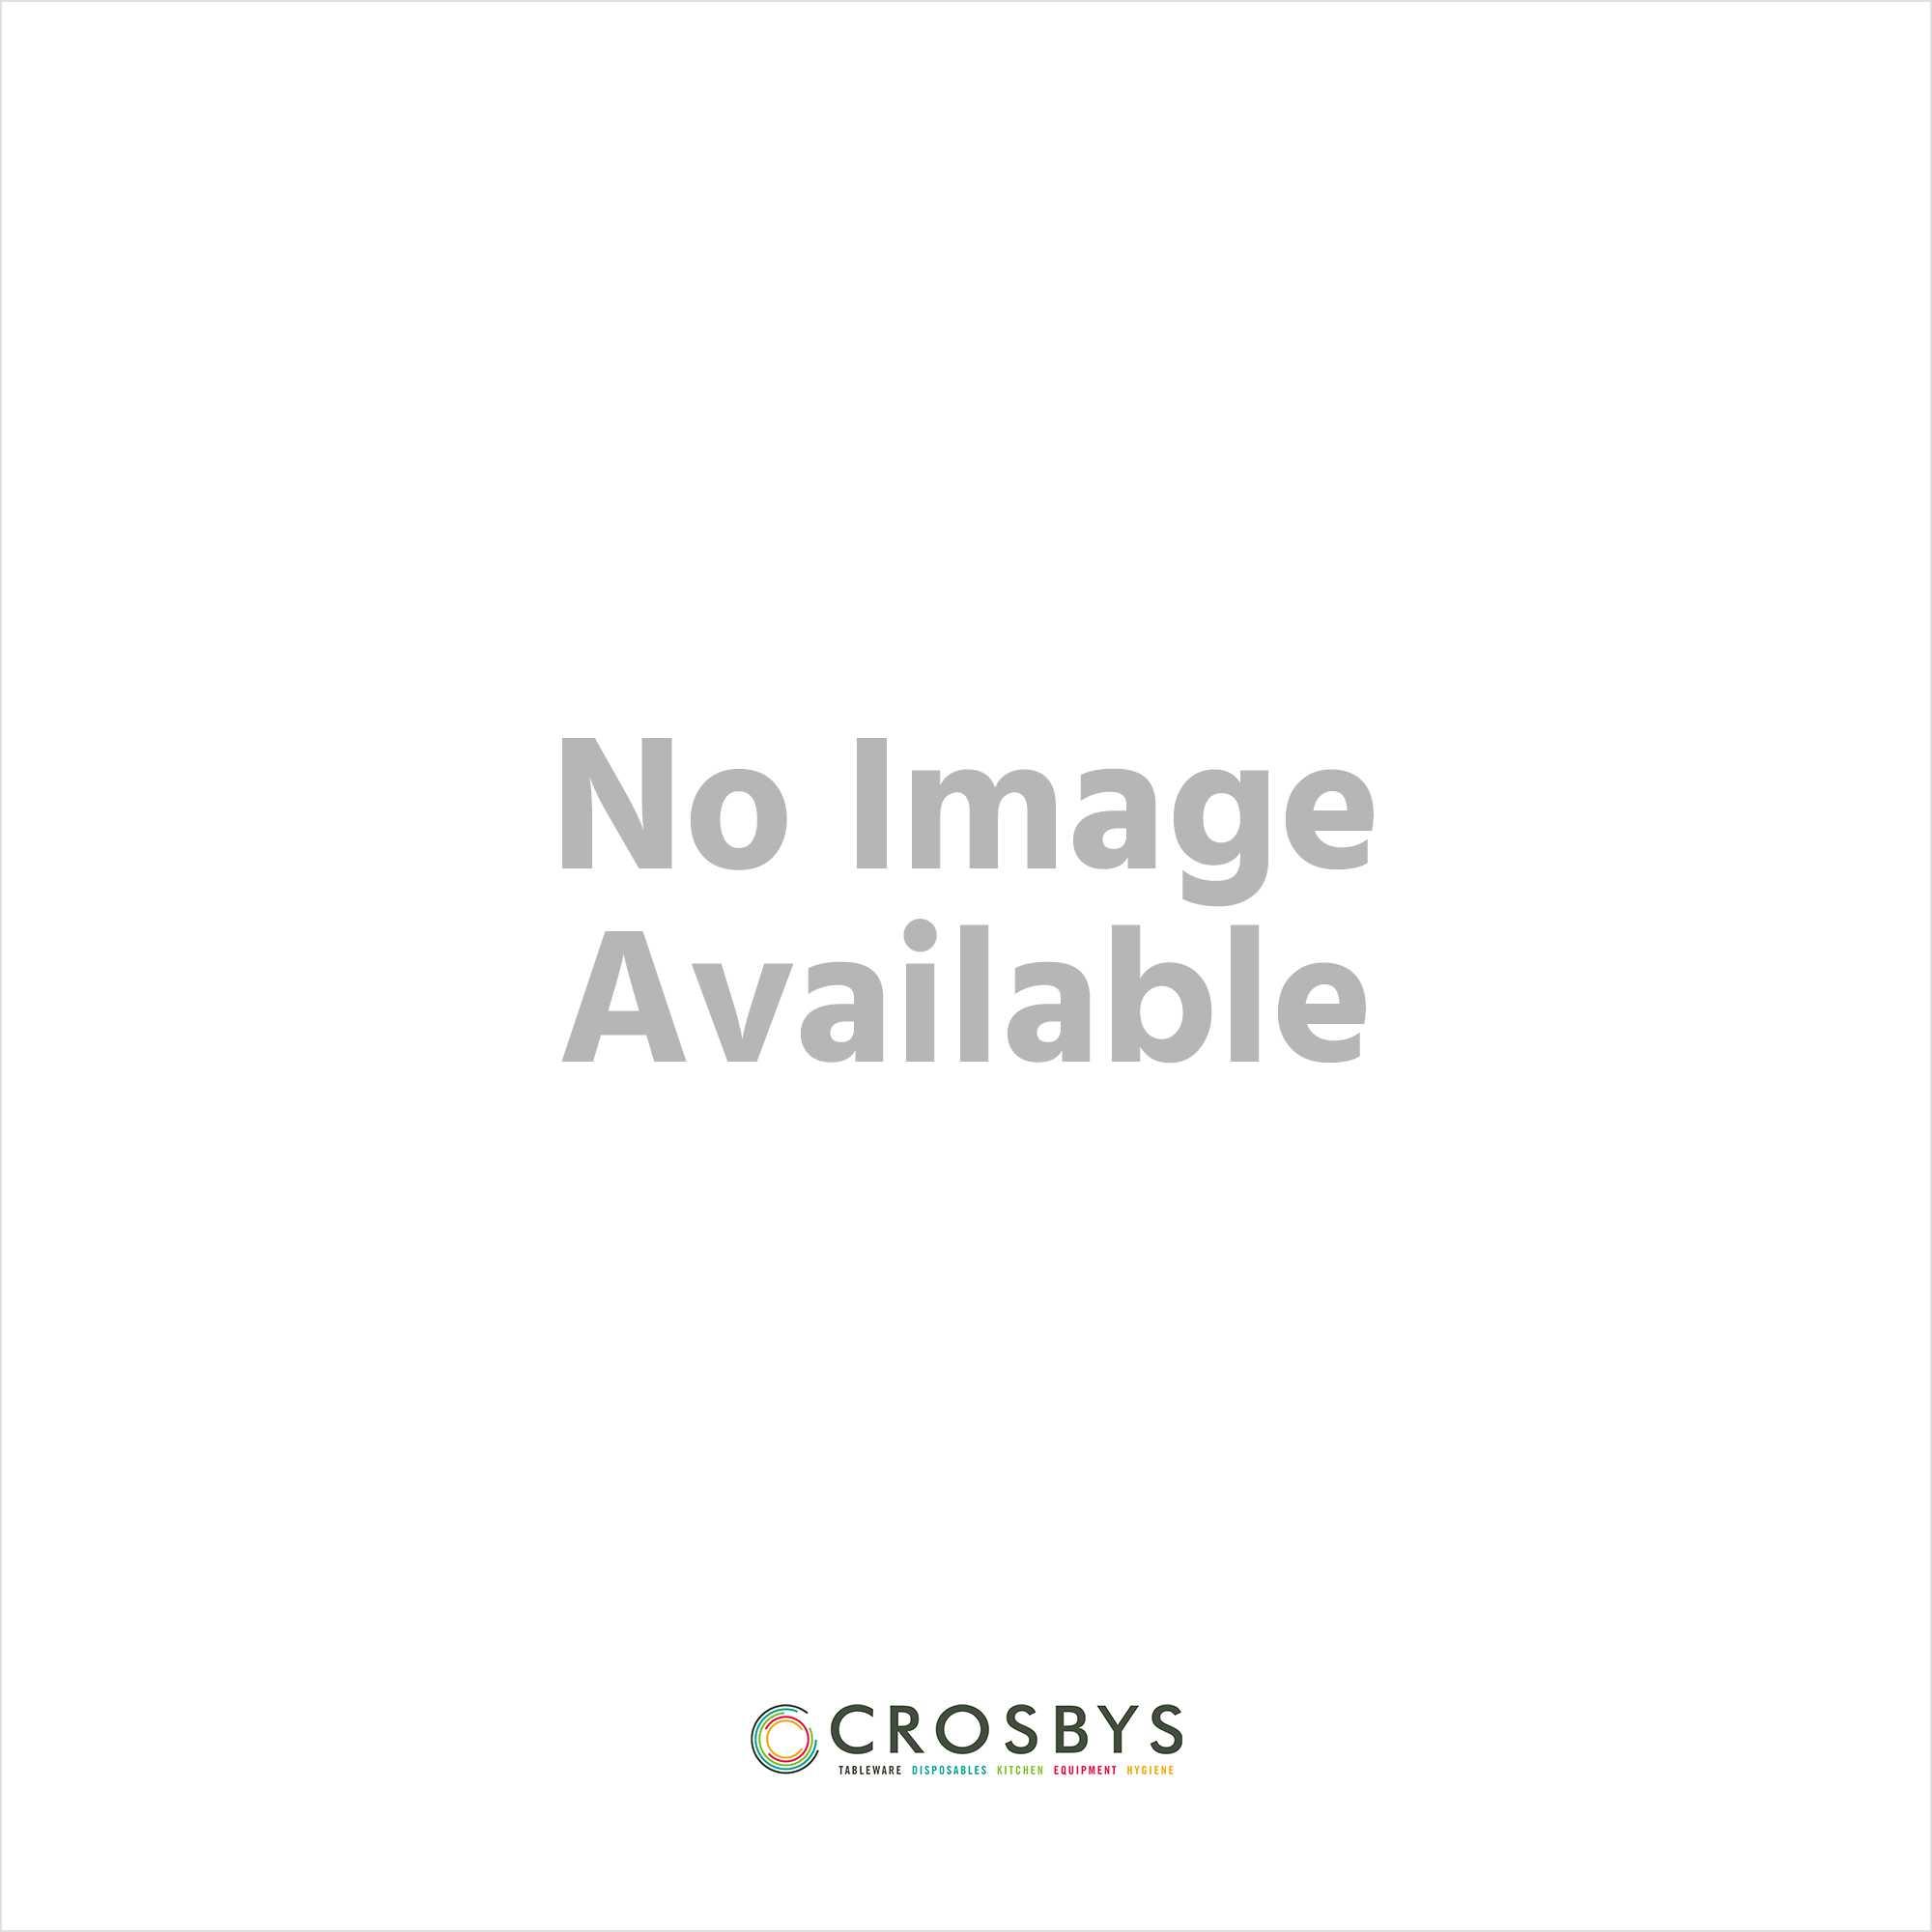 Enamel Baking Tray GN 1/2 325 x 265 x 65mm - Catering